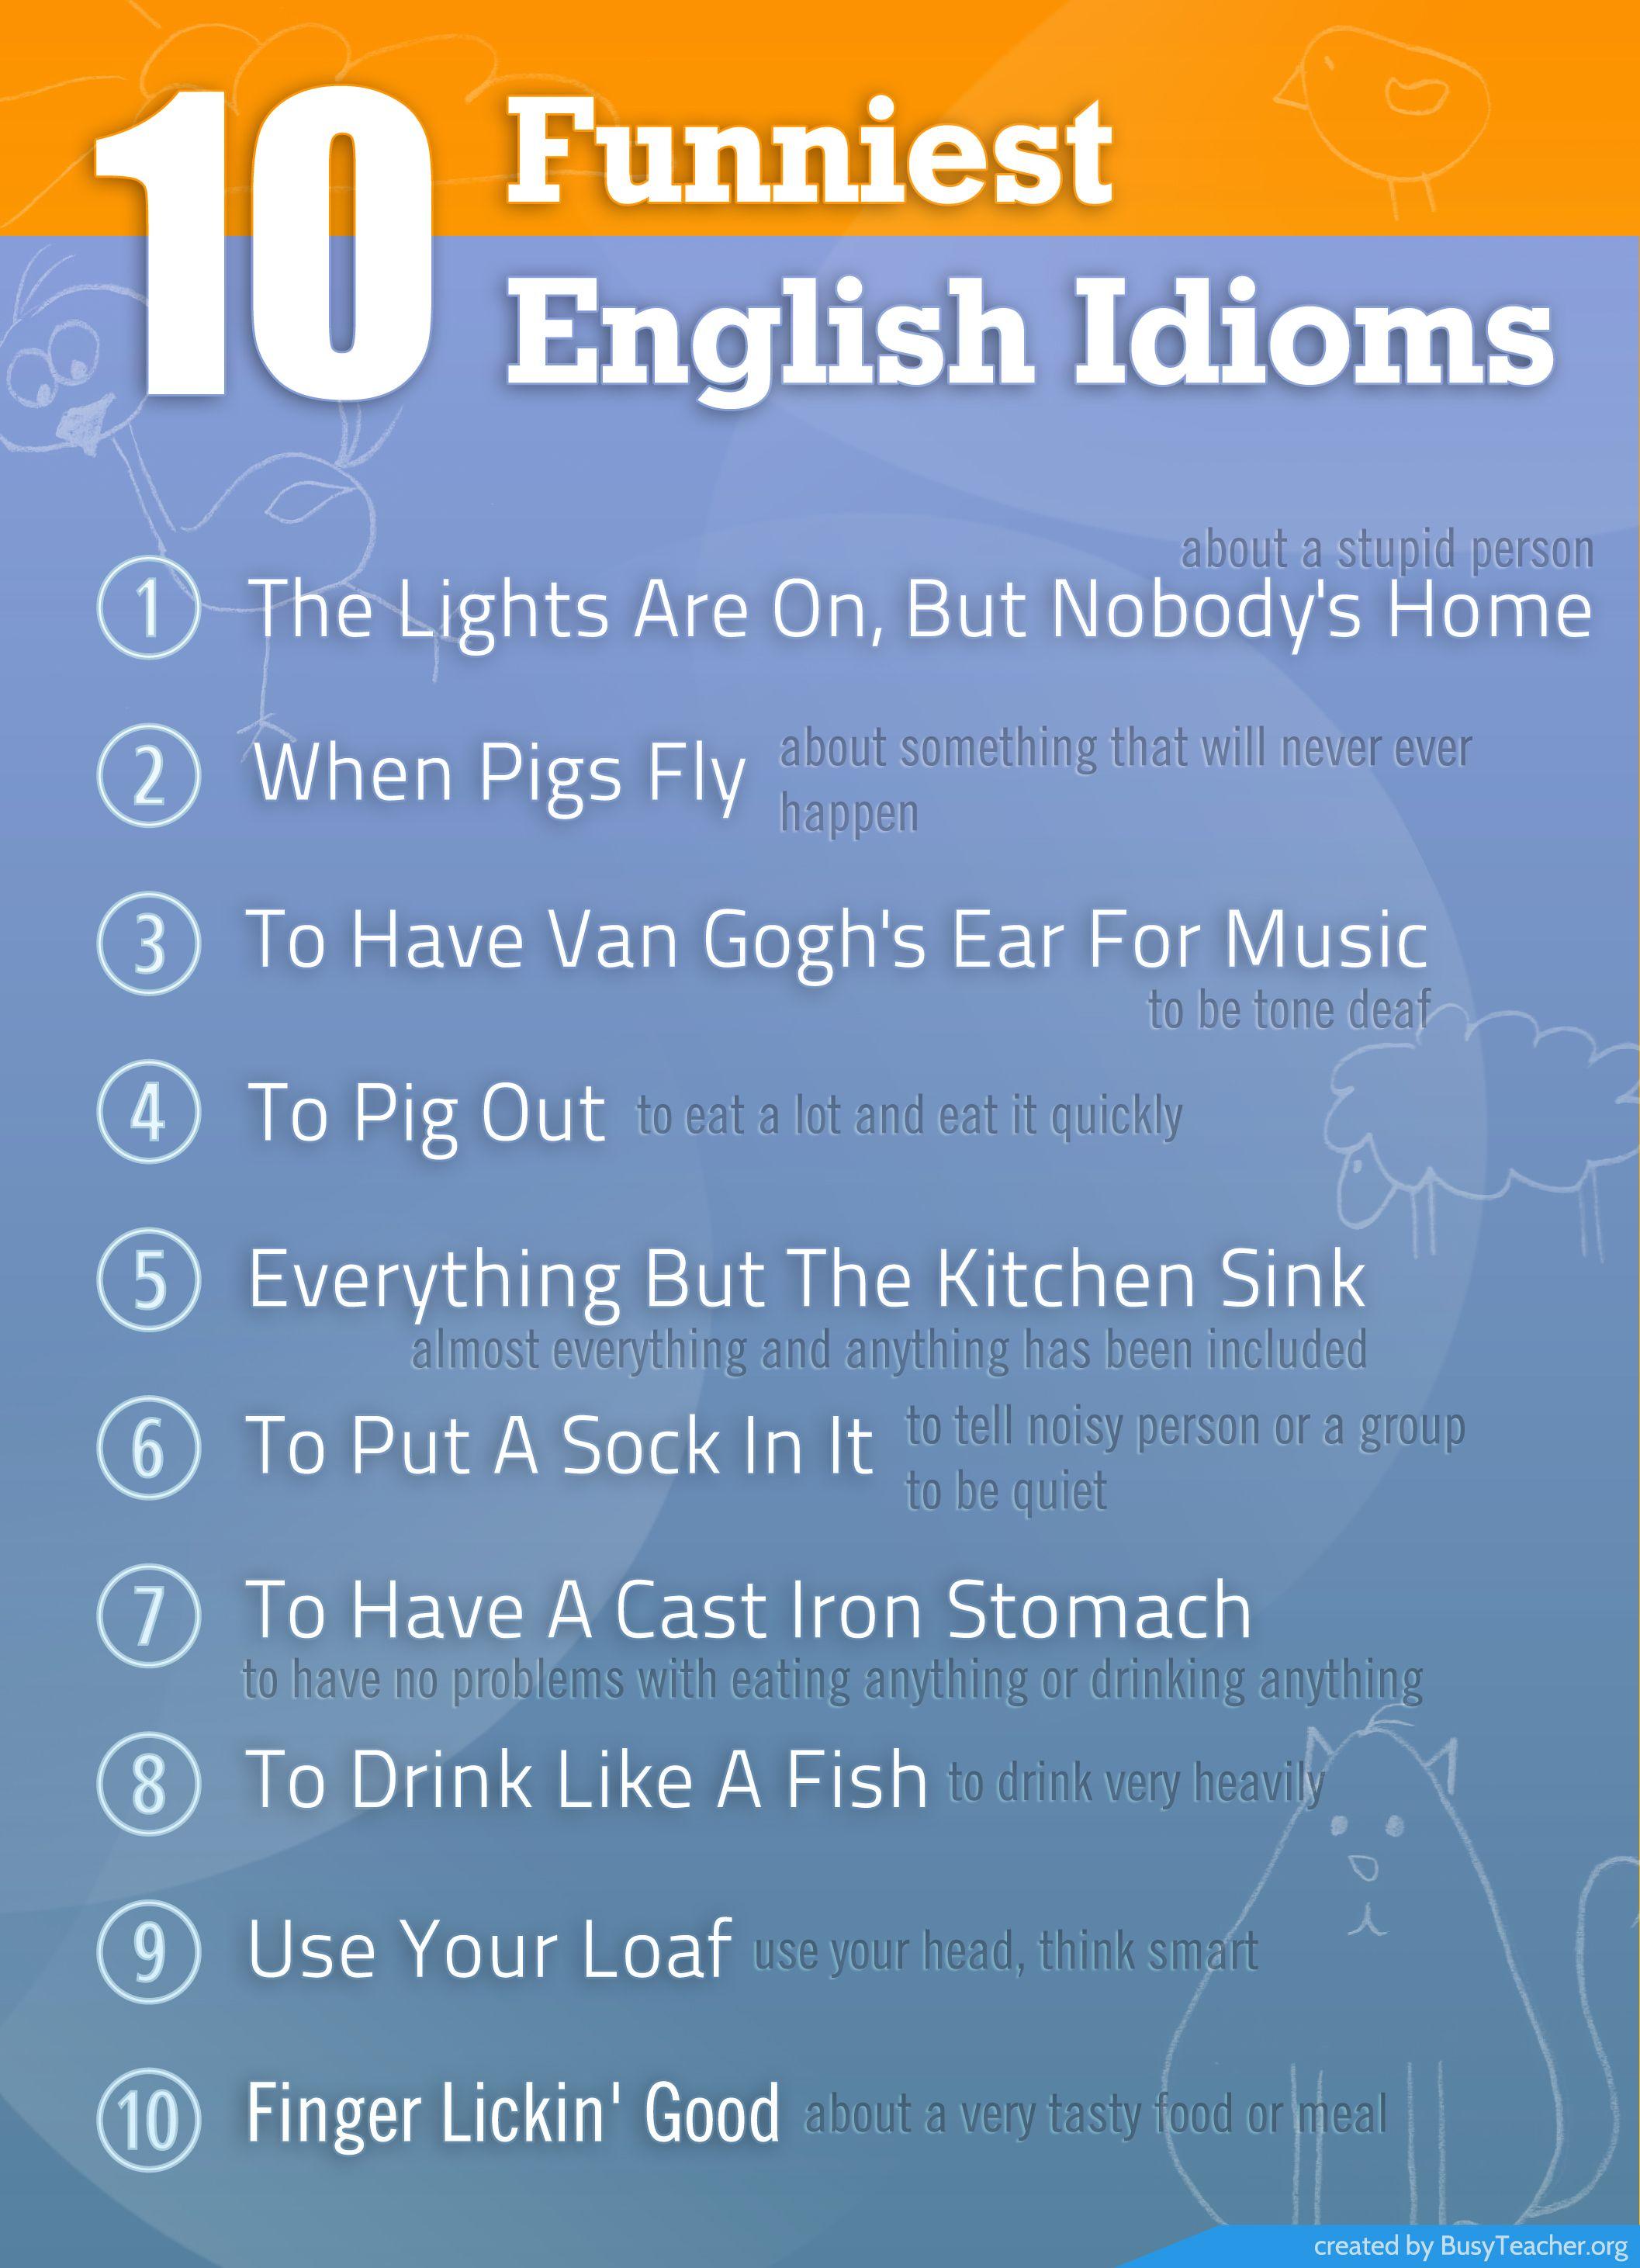 Funniest English Idioms English Idioms Funny